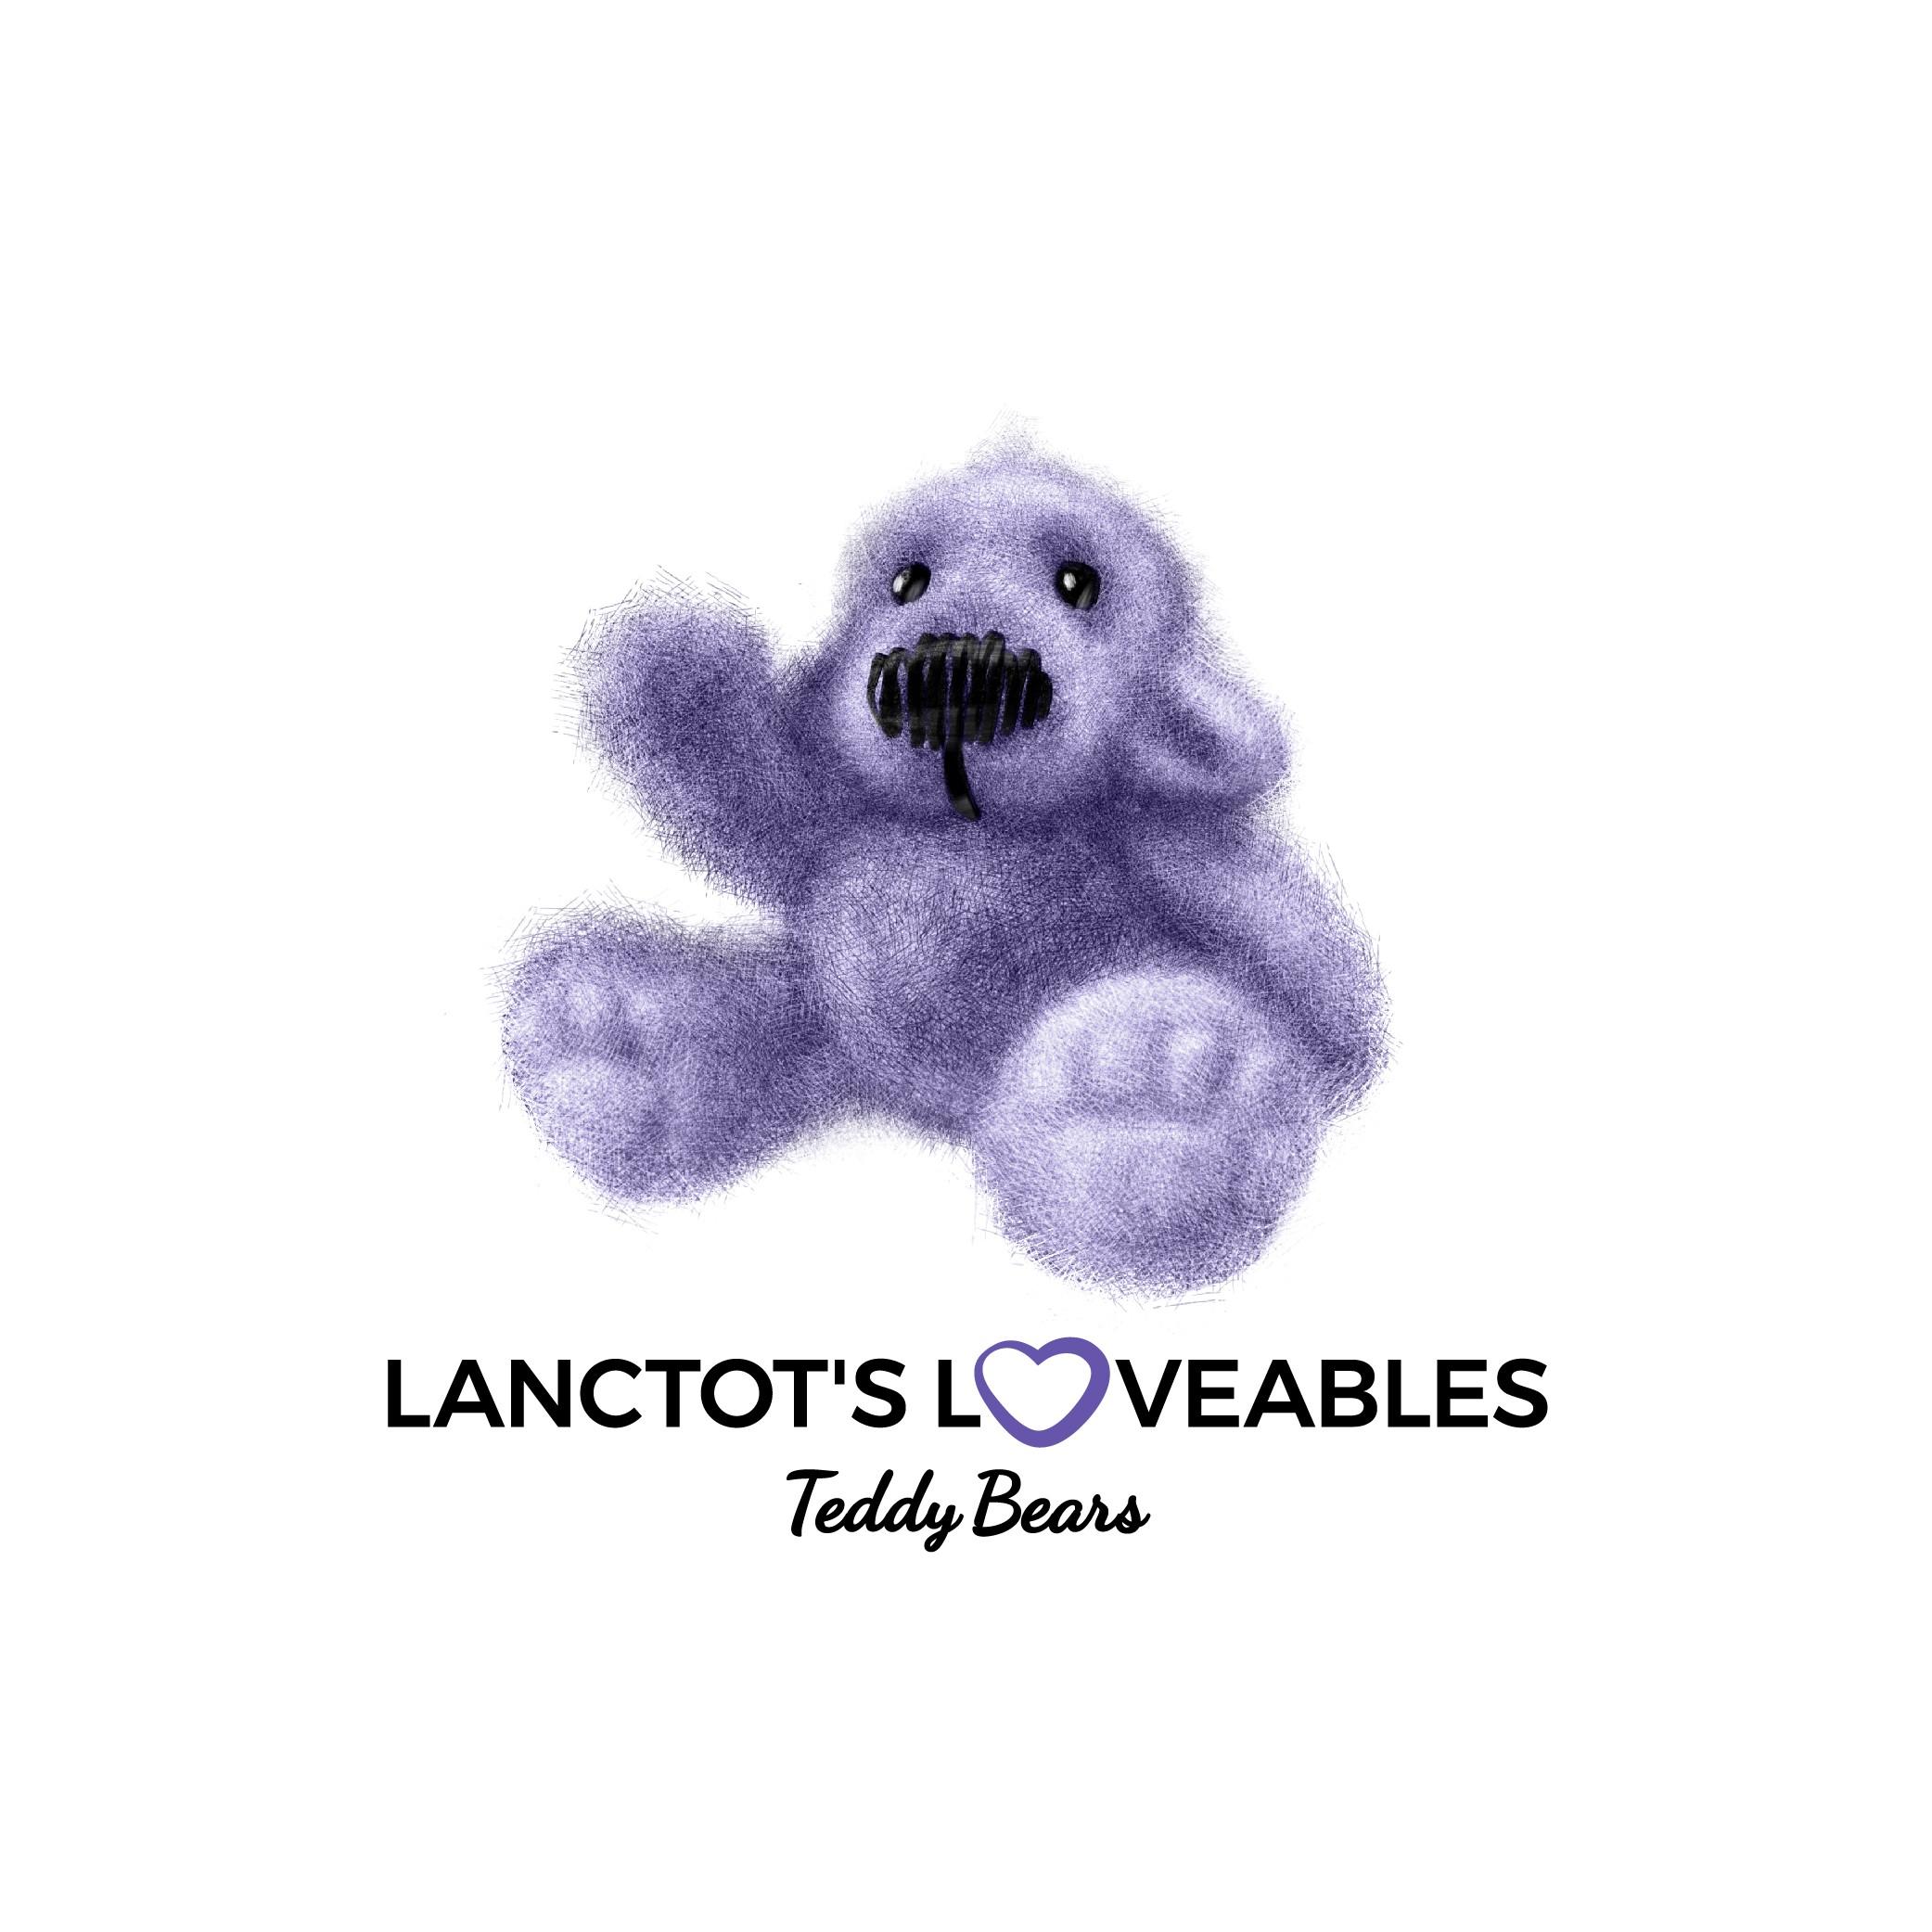 Teddy Bear designer/artist needs a cute logo that tugs at heart strings